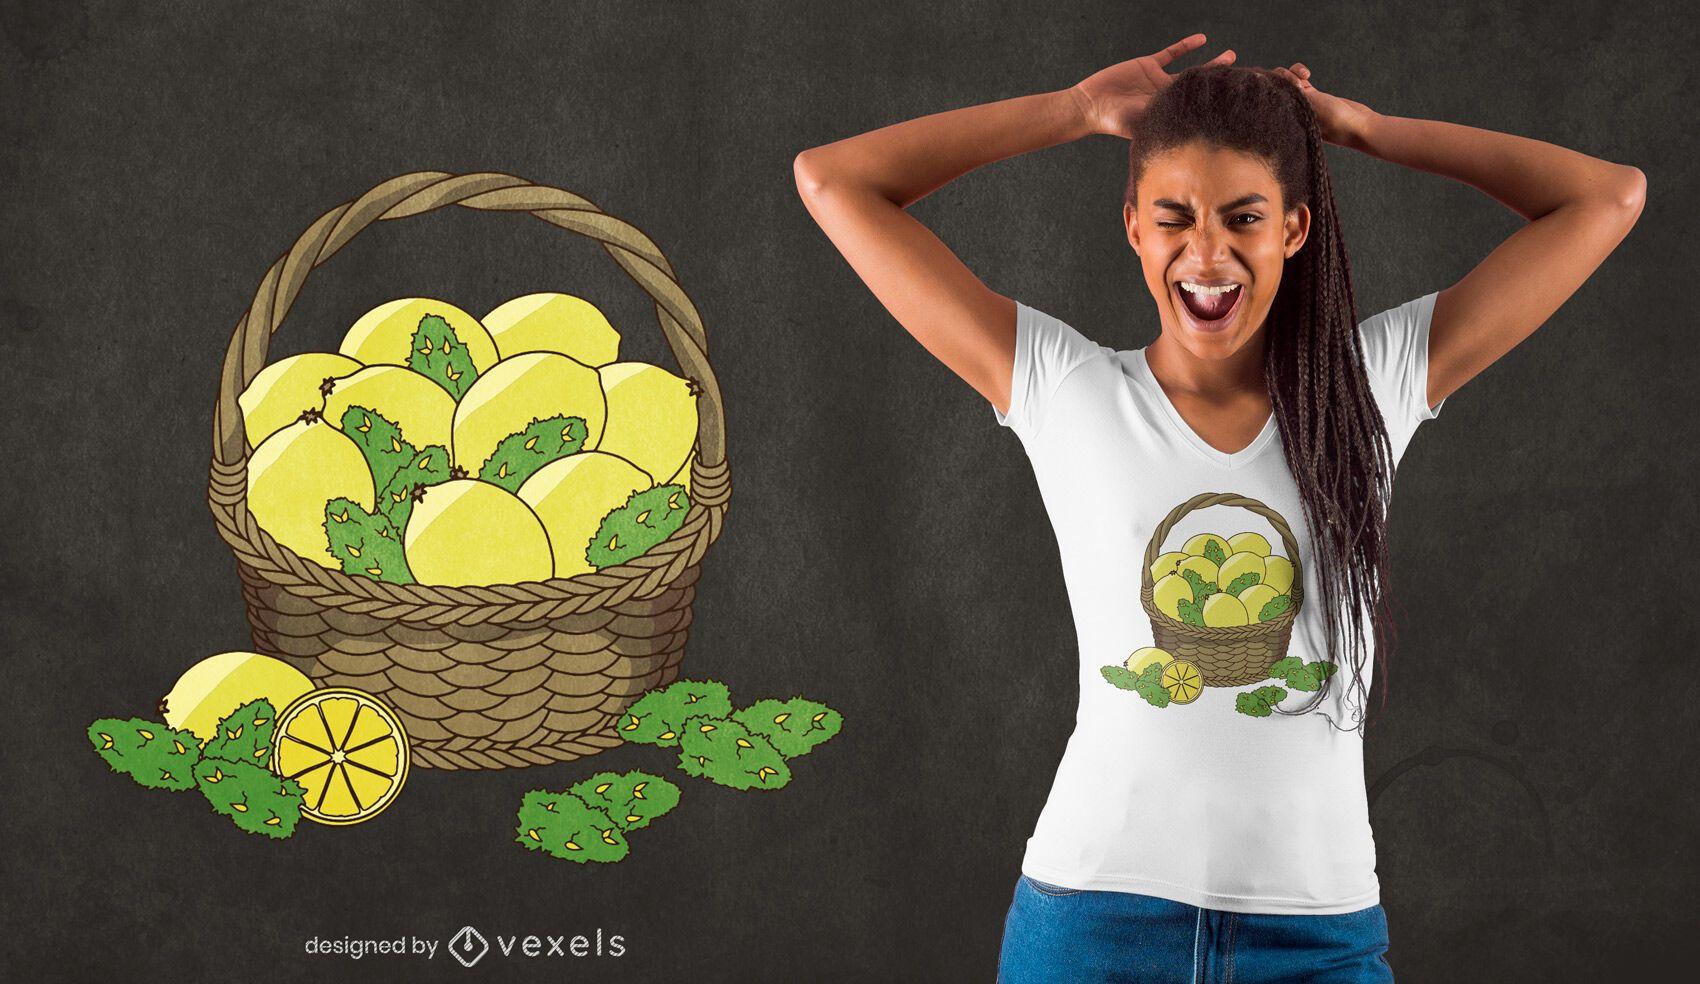 Dise?o de camiseta lemon kush